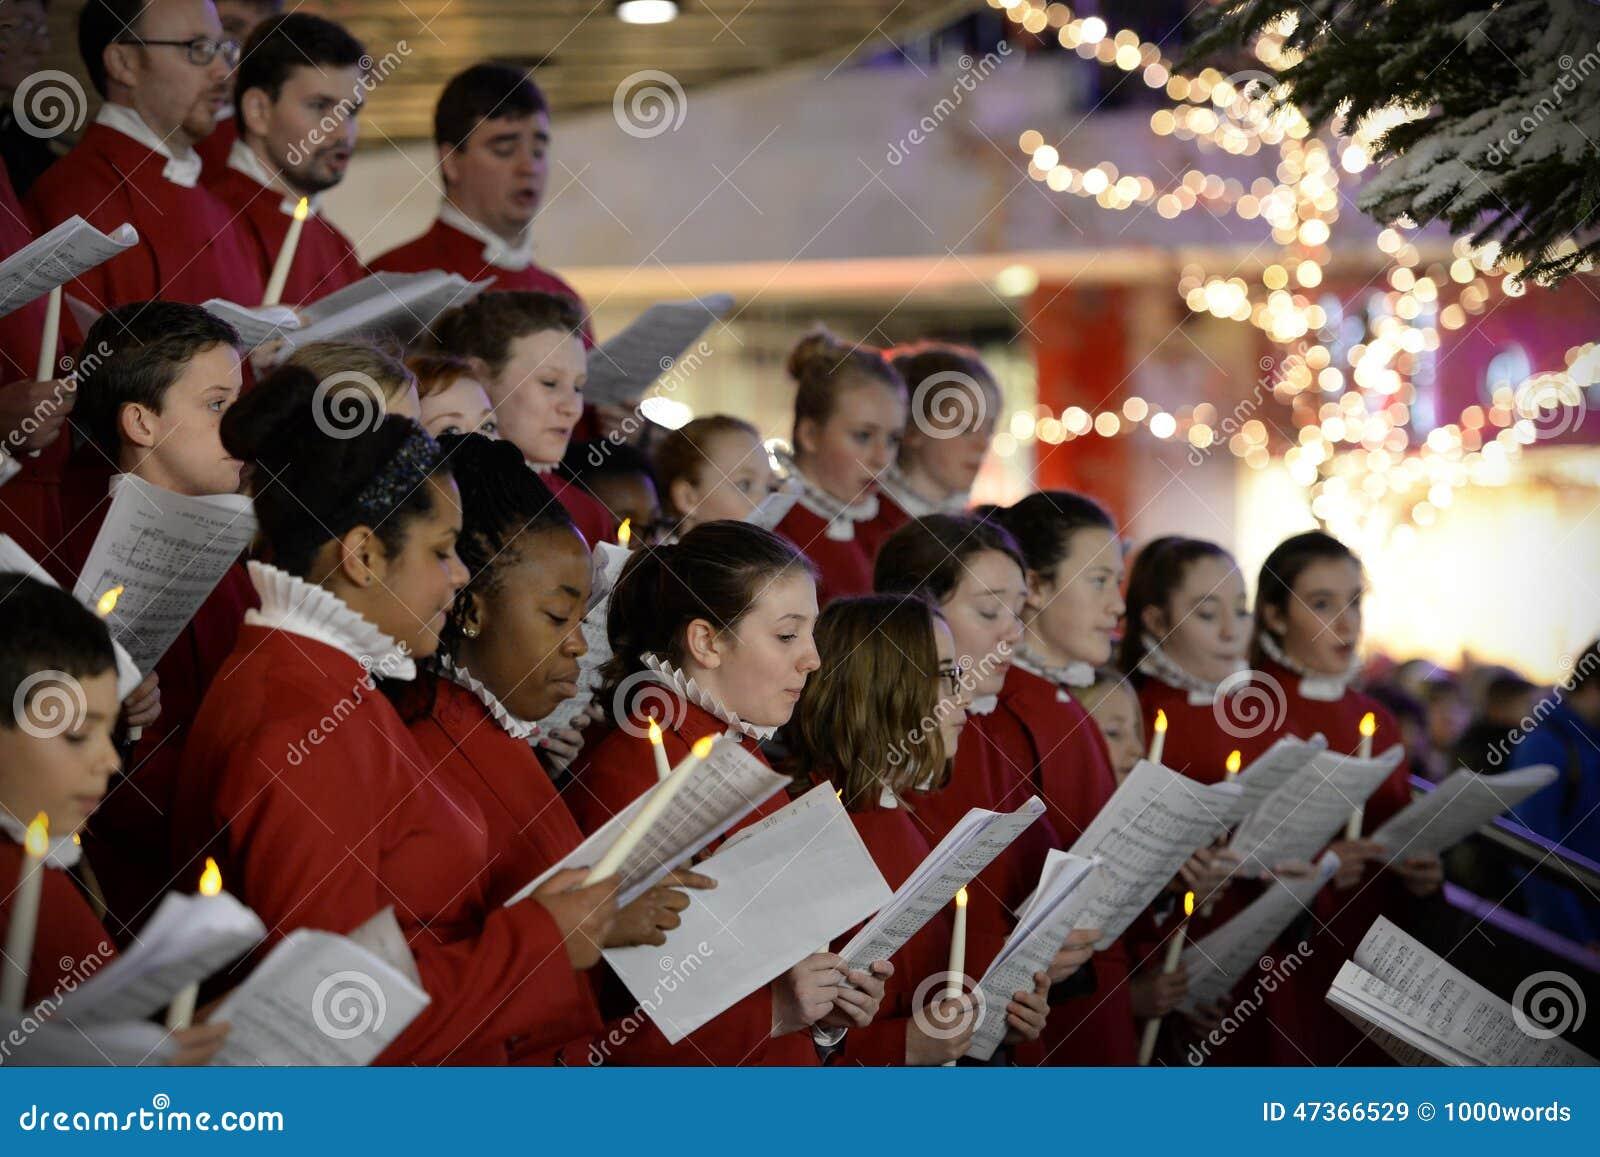 Choir Perform Christmas Carols